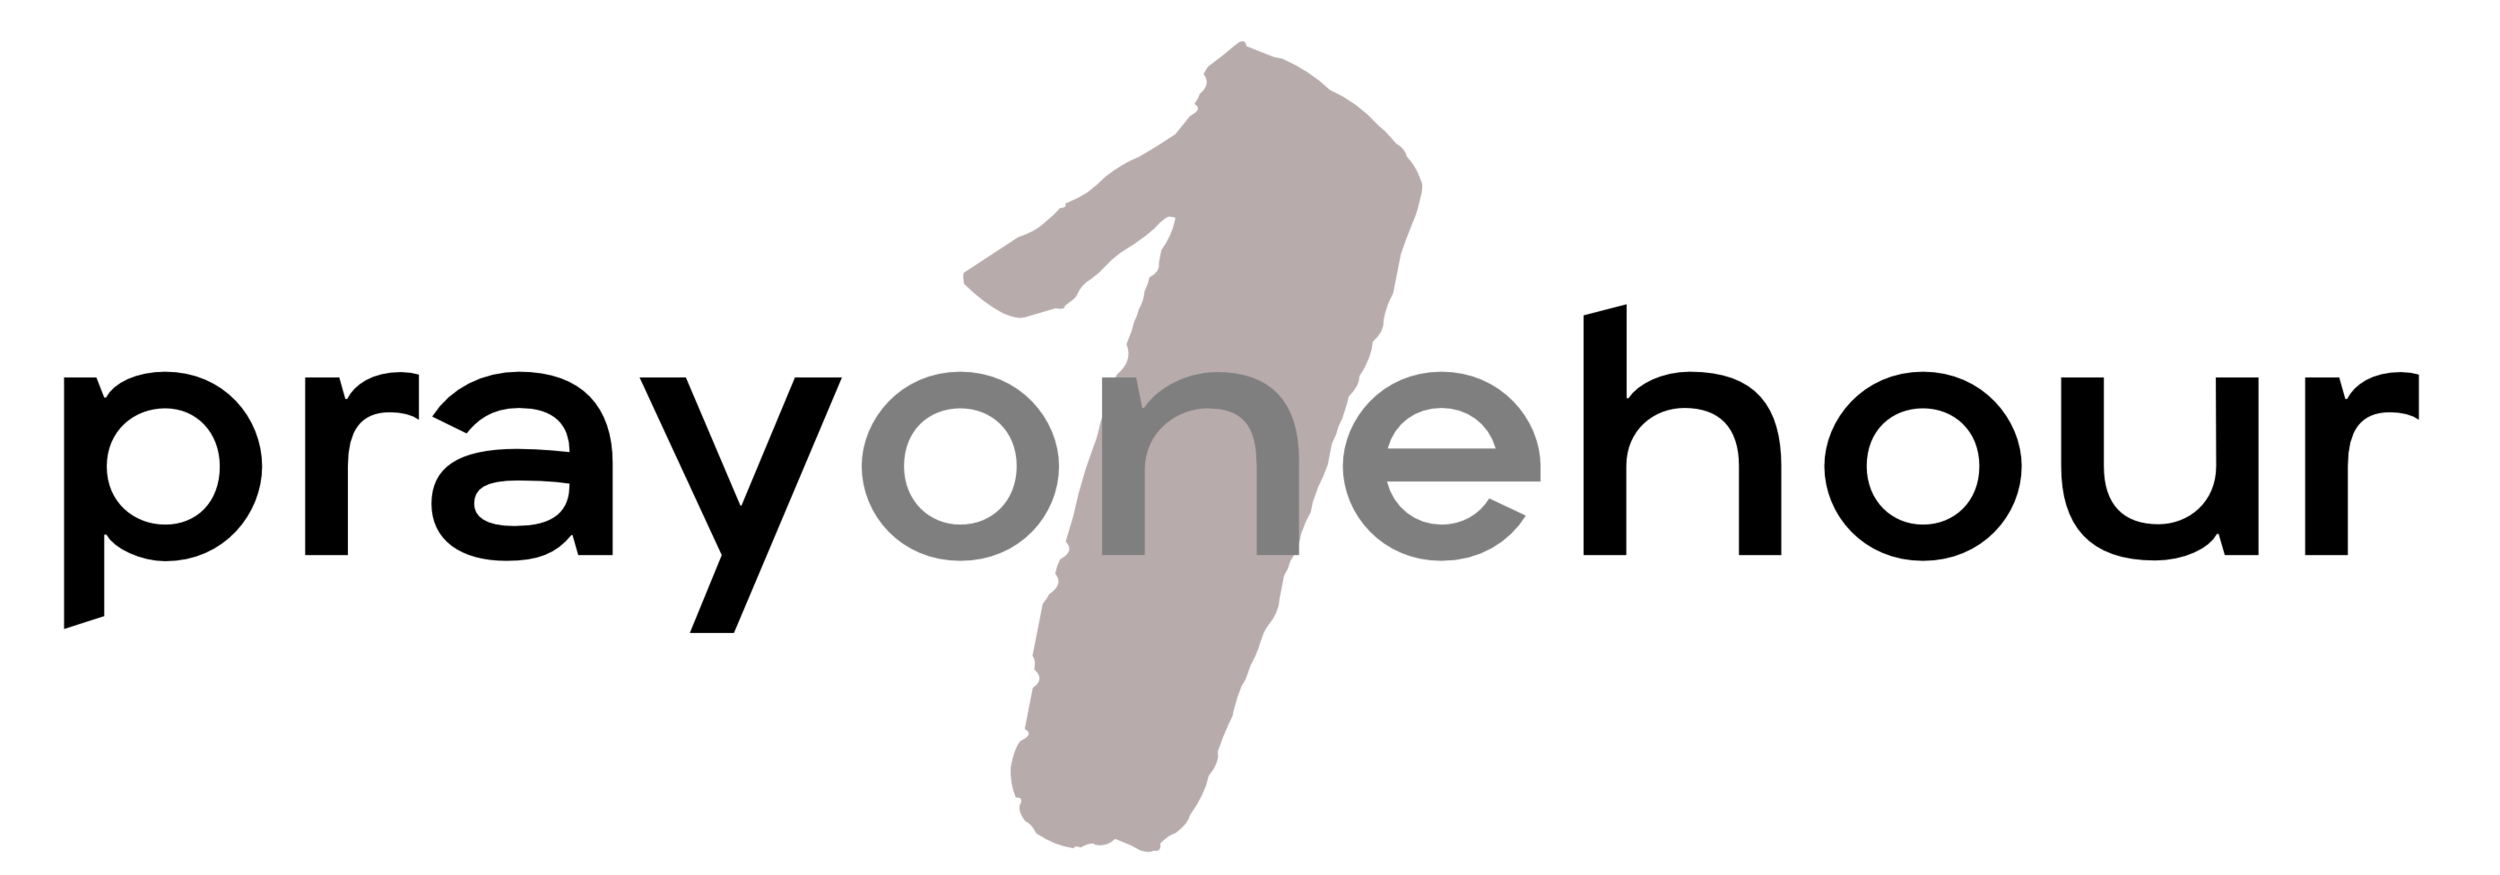 prayonehour logo.png